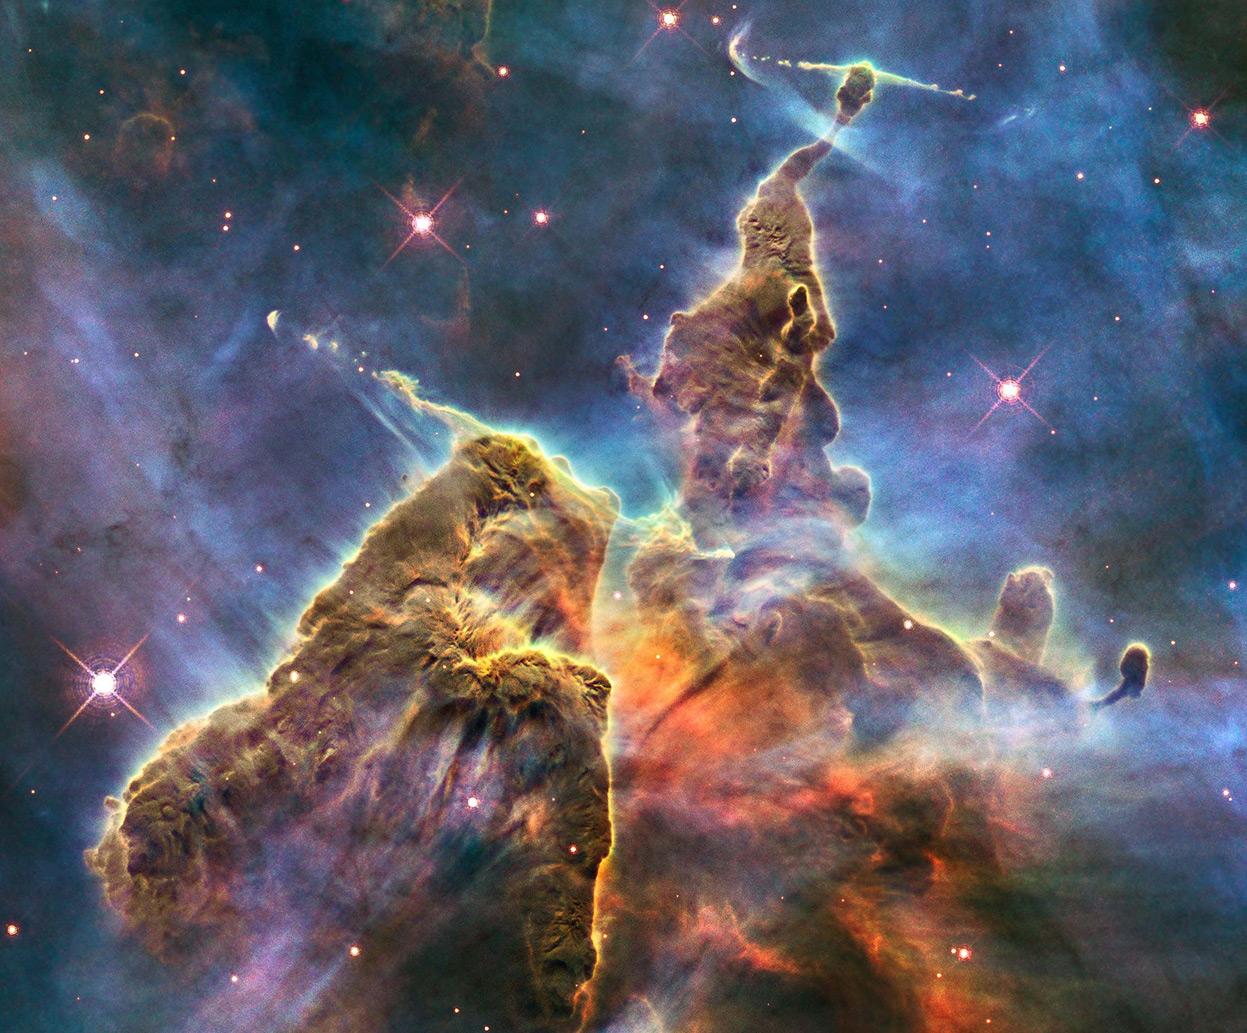 2012 Hubble Space Telescope Advent Calendar In Focus The 1247x1033